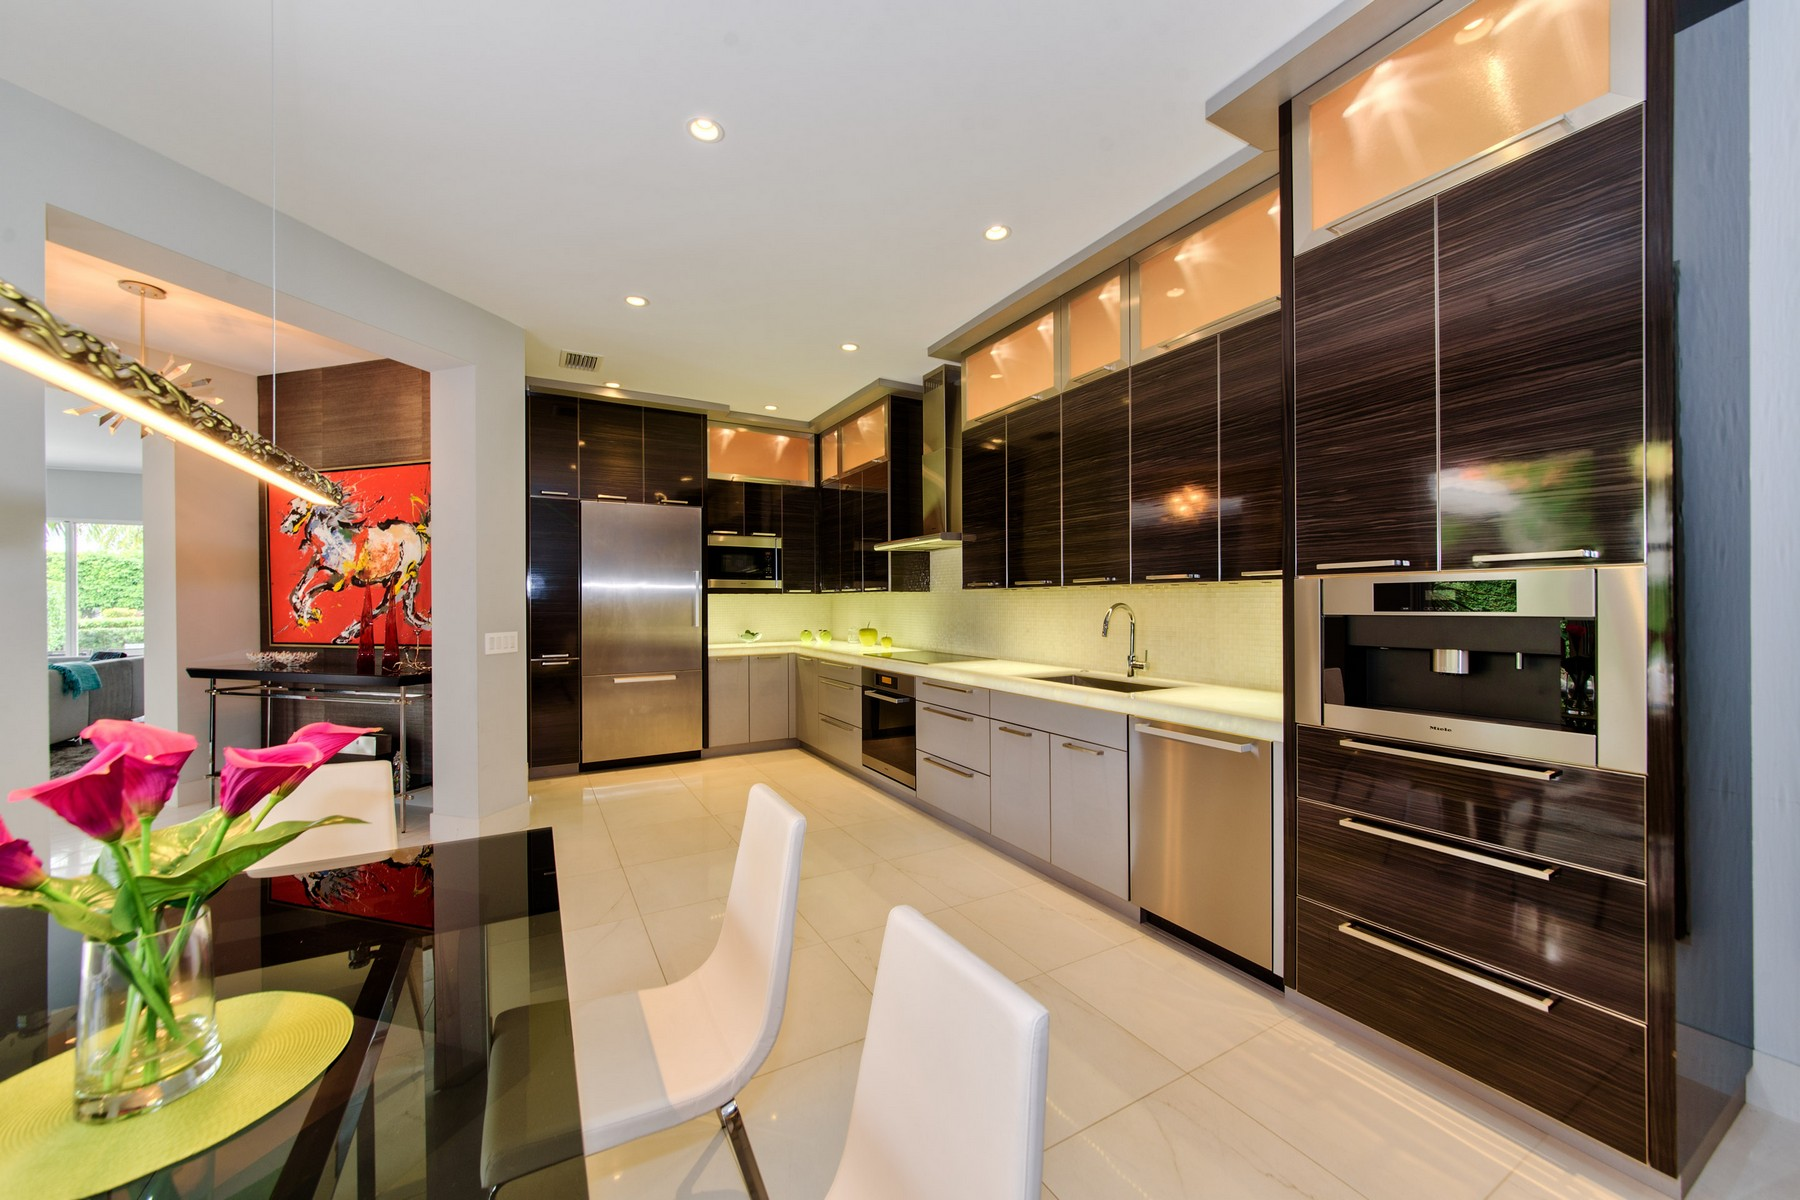 Single Family Home for Sale at 14180 Calypso Lane Equestrian Club Estates, Wellington, Florida, 33414 United States